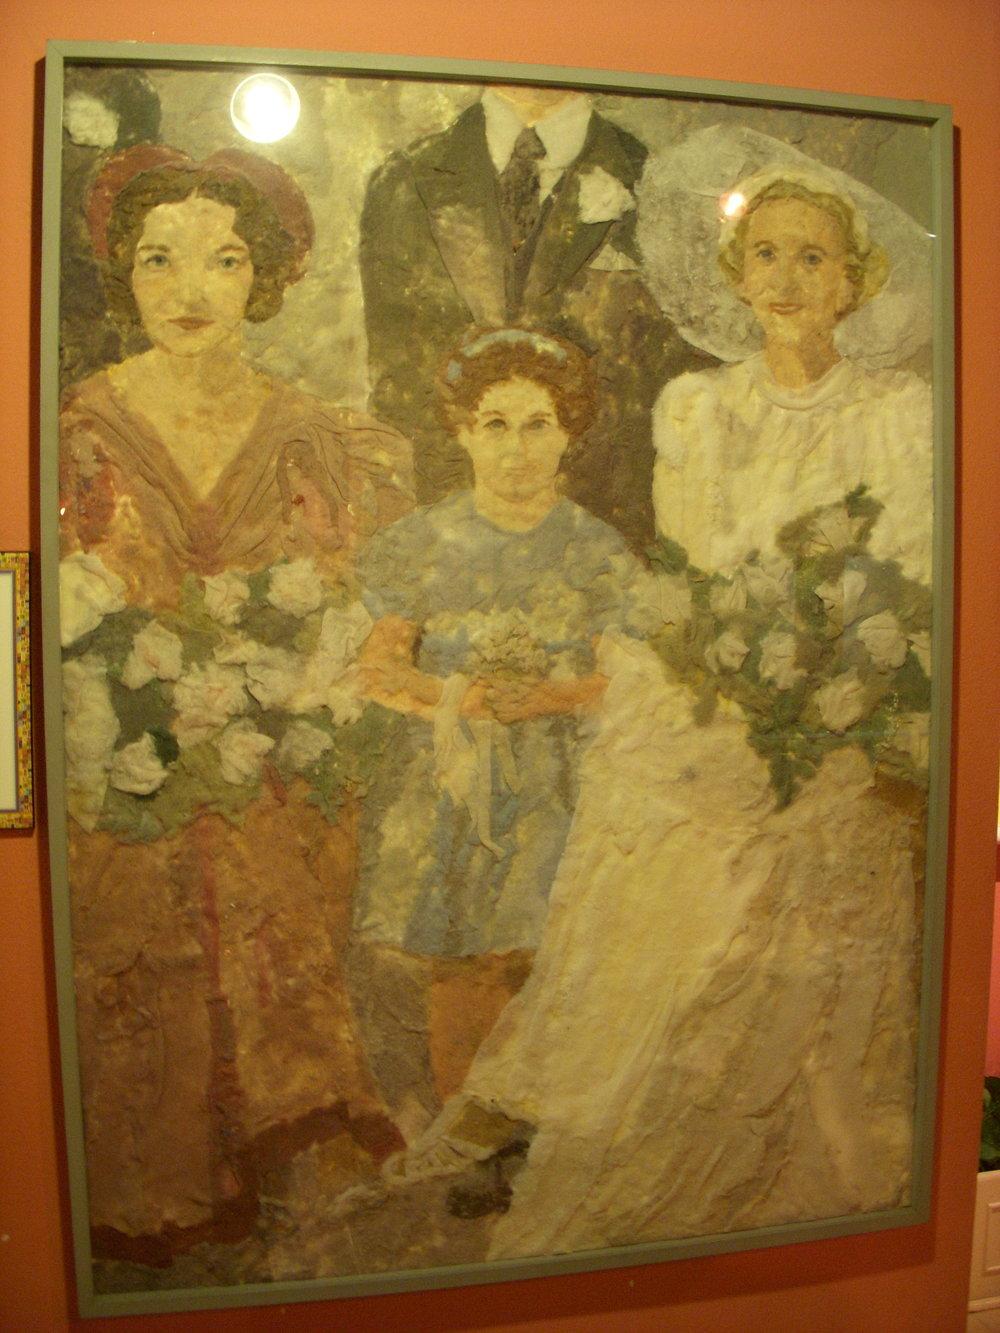 Dryer lint family